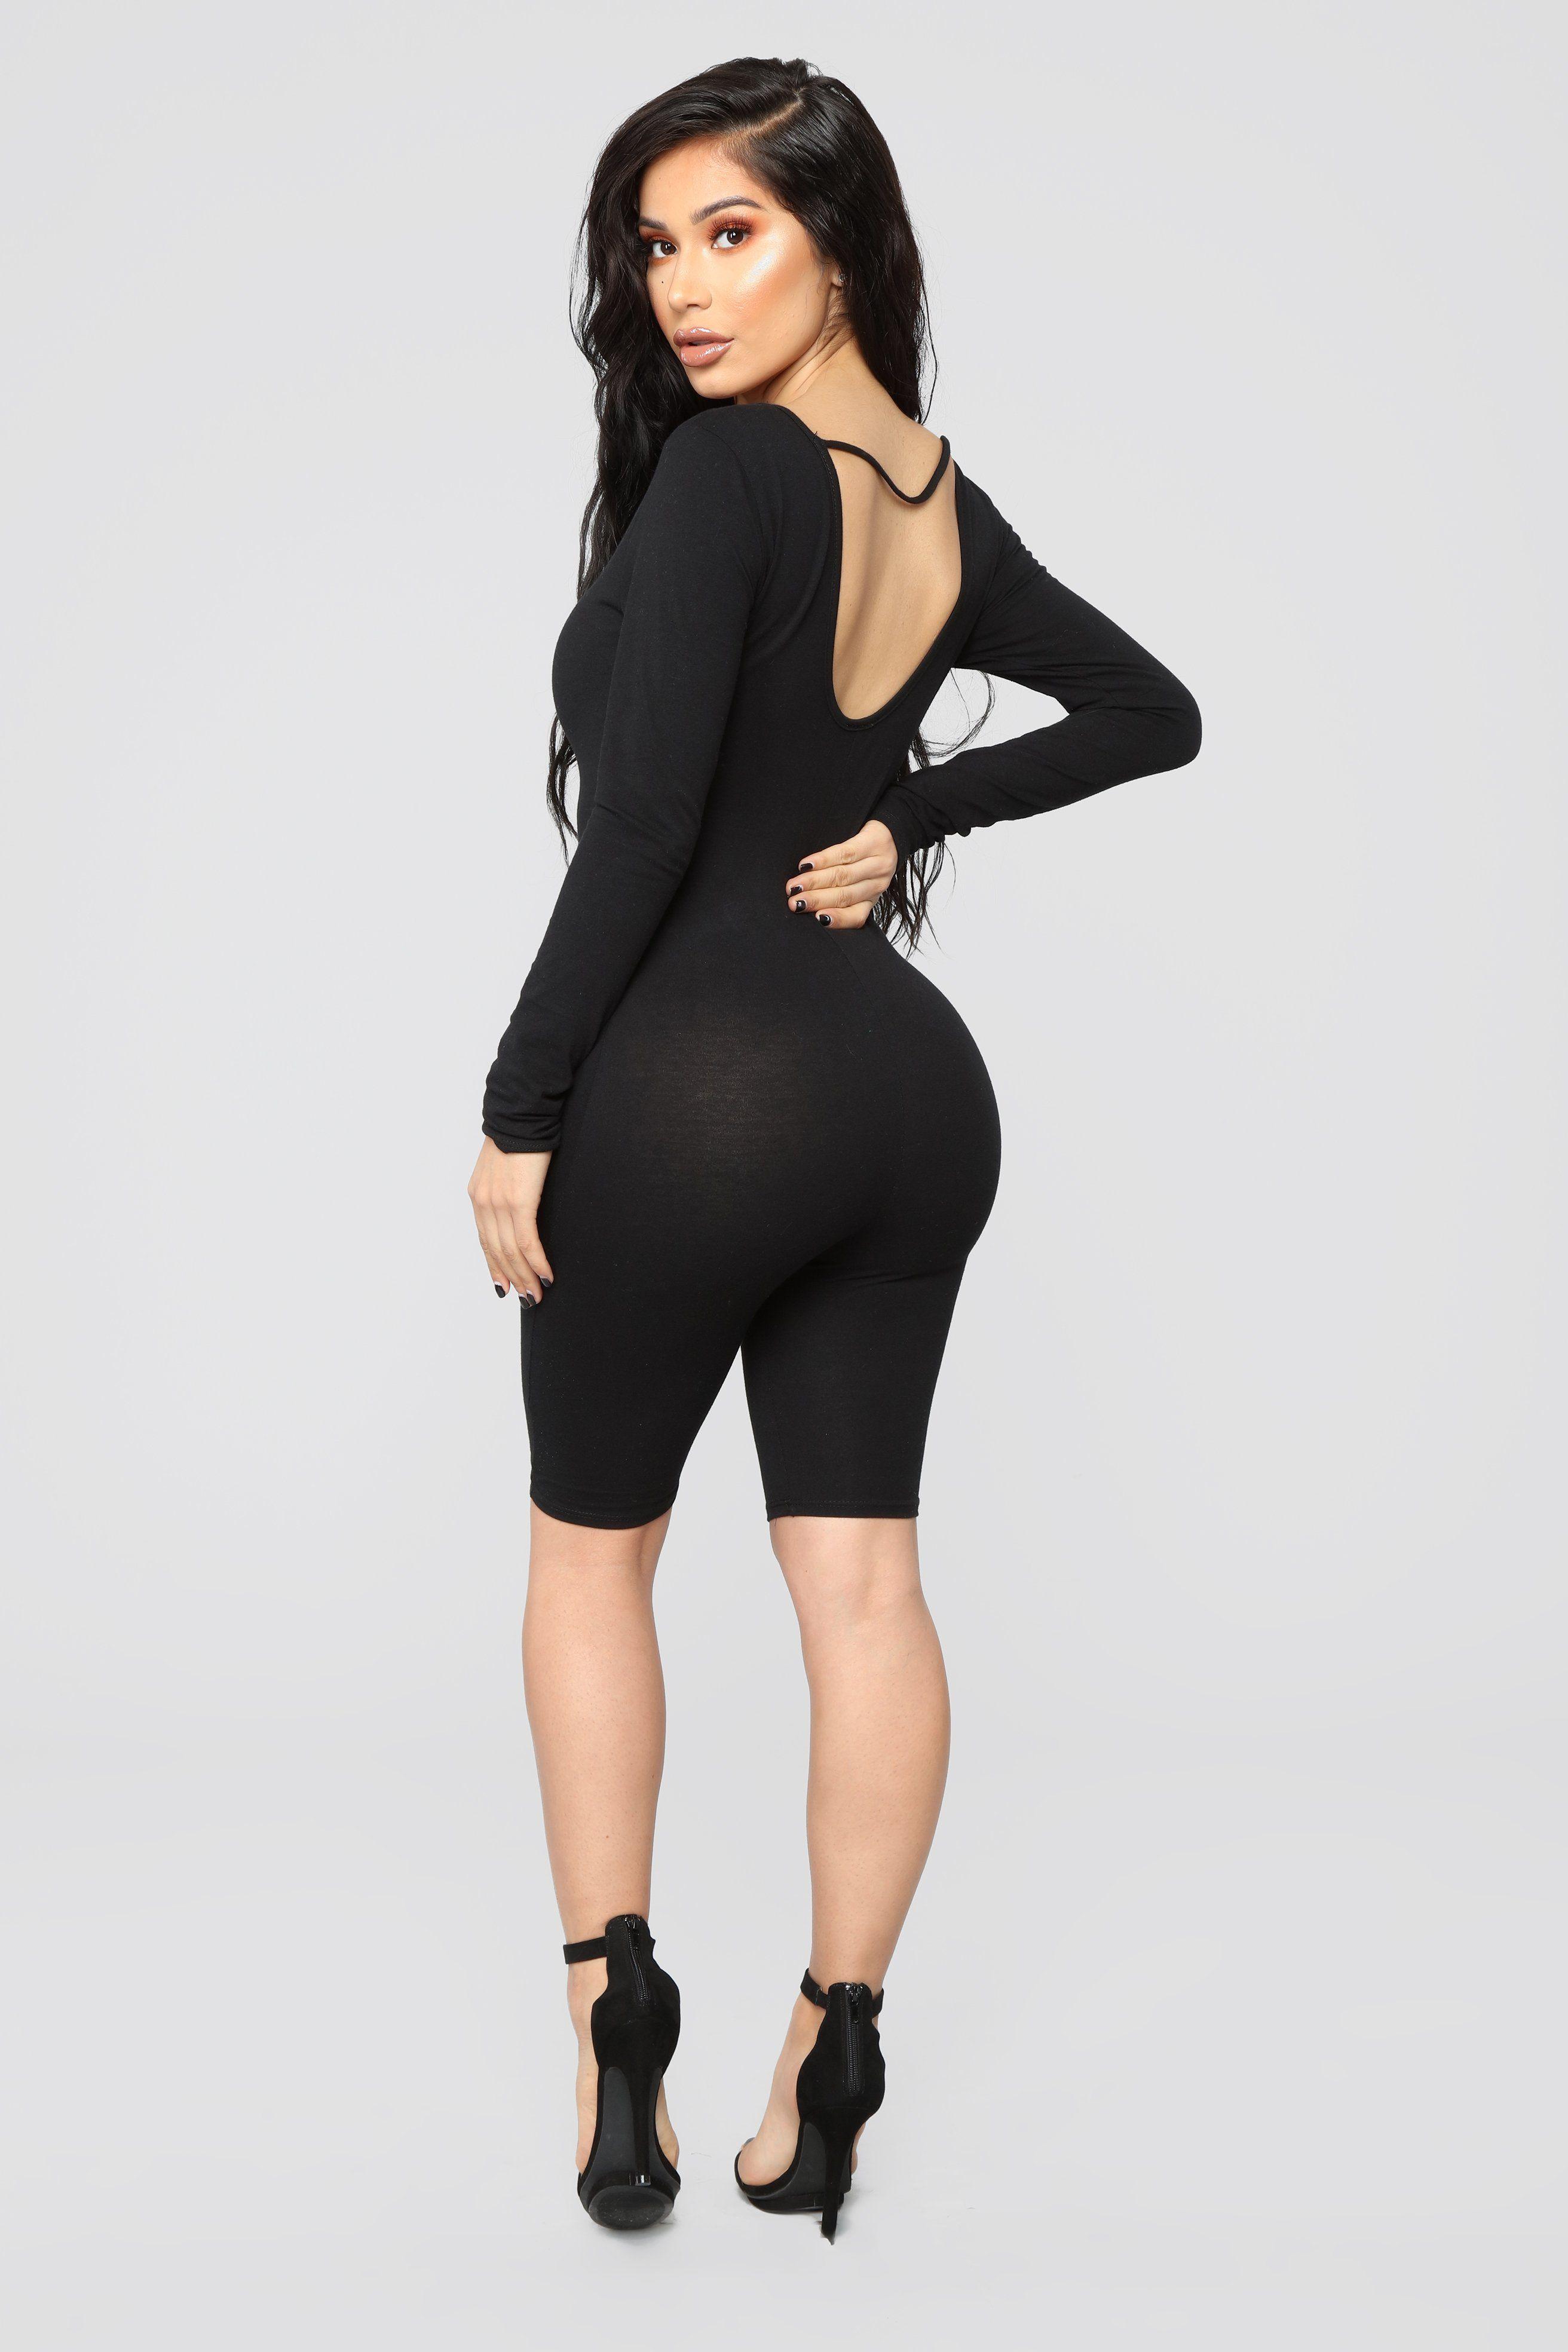 d18df409816 Nellie Biker Short Romper - Black in 2019